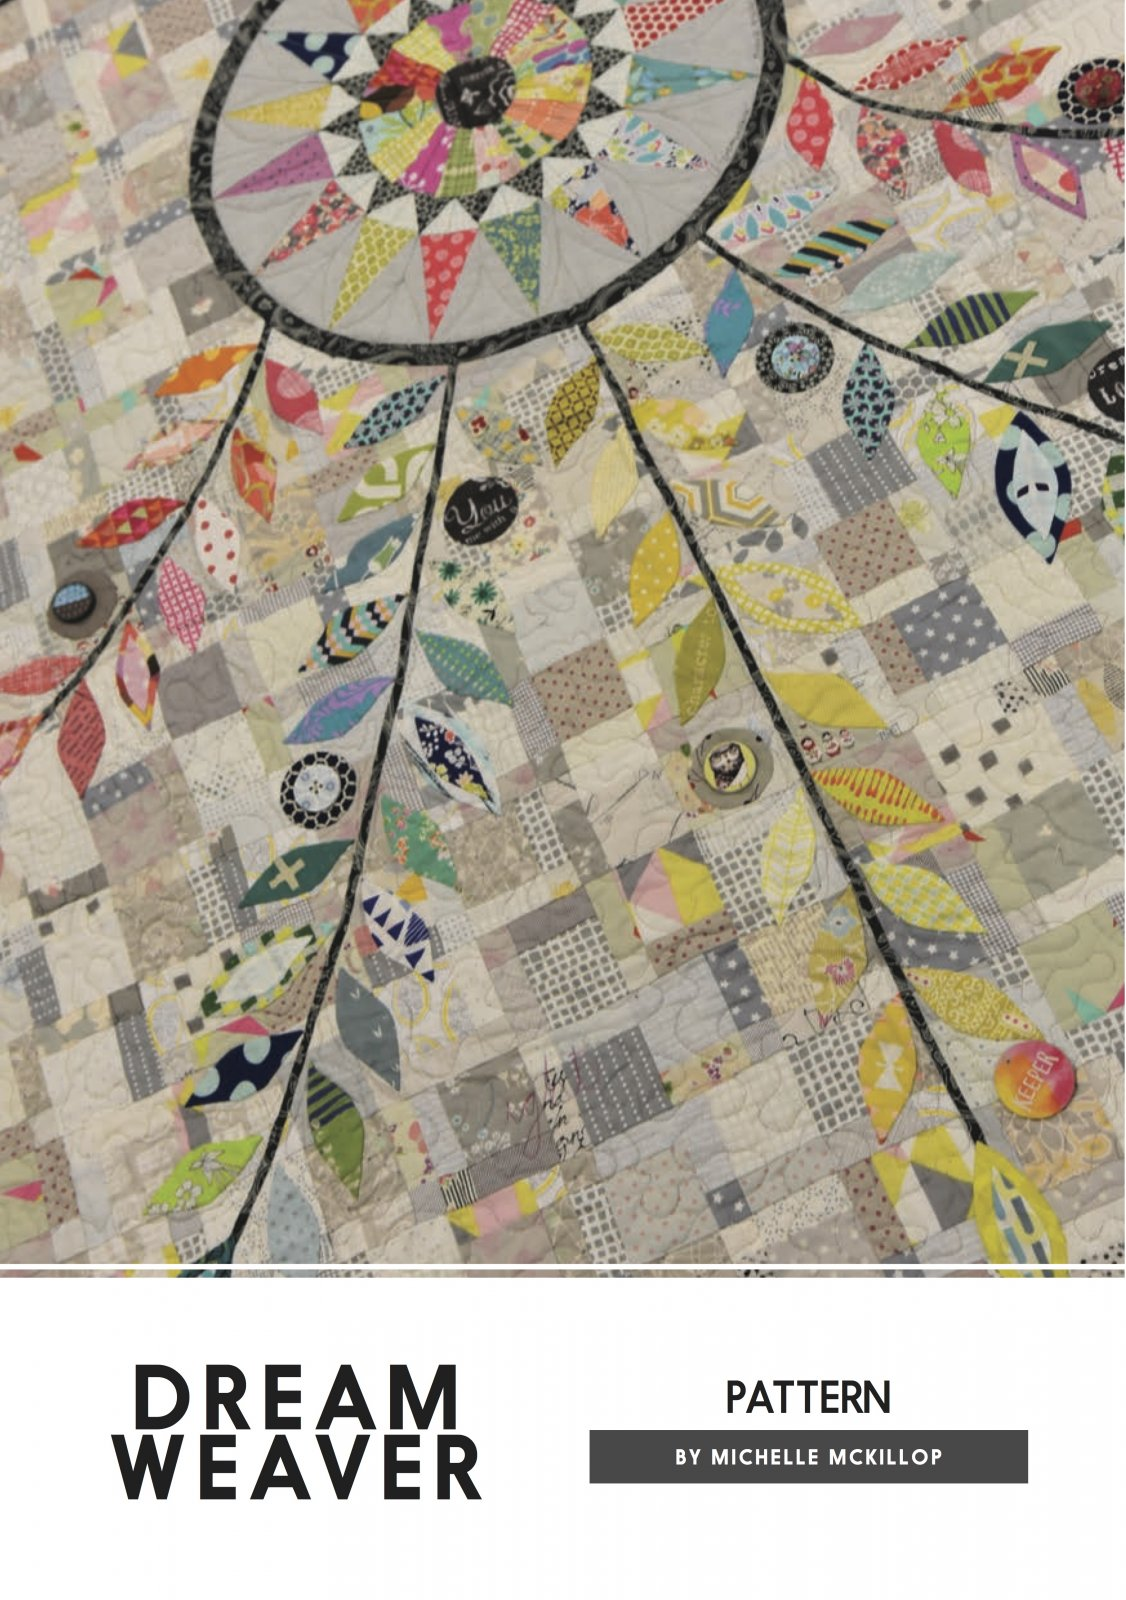 Dream Weaver Pattern by Michelle McKillop